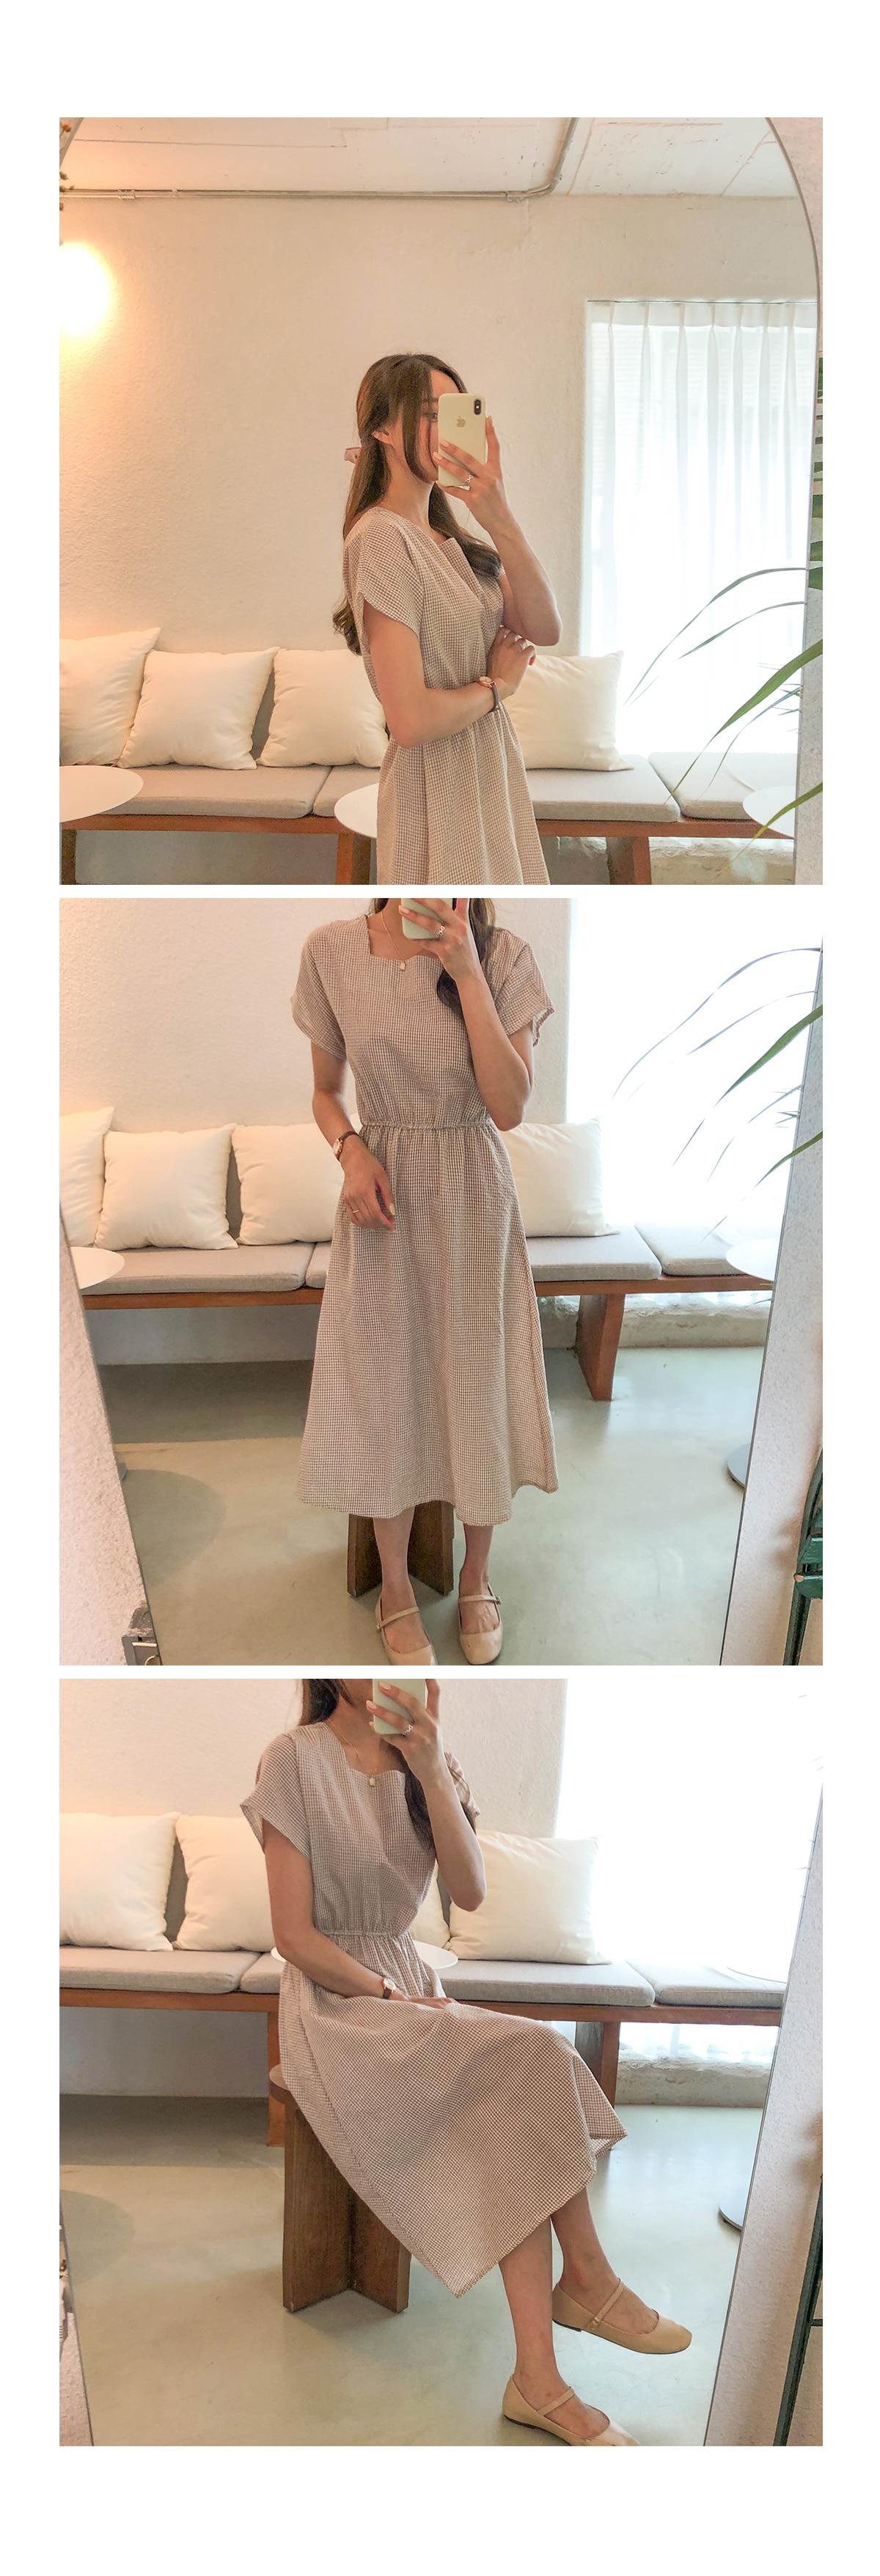 Check Lulu Square Dress